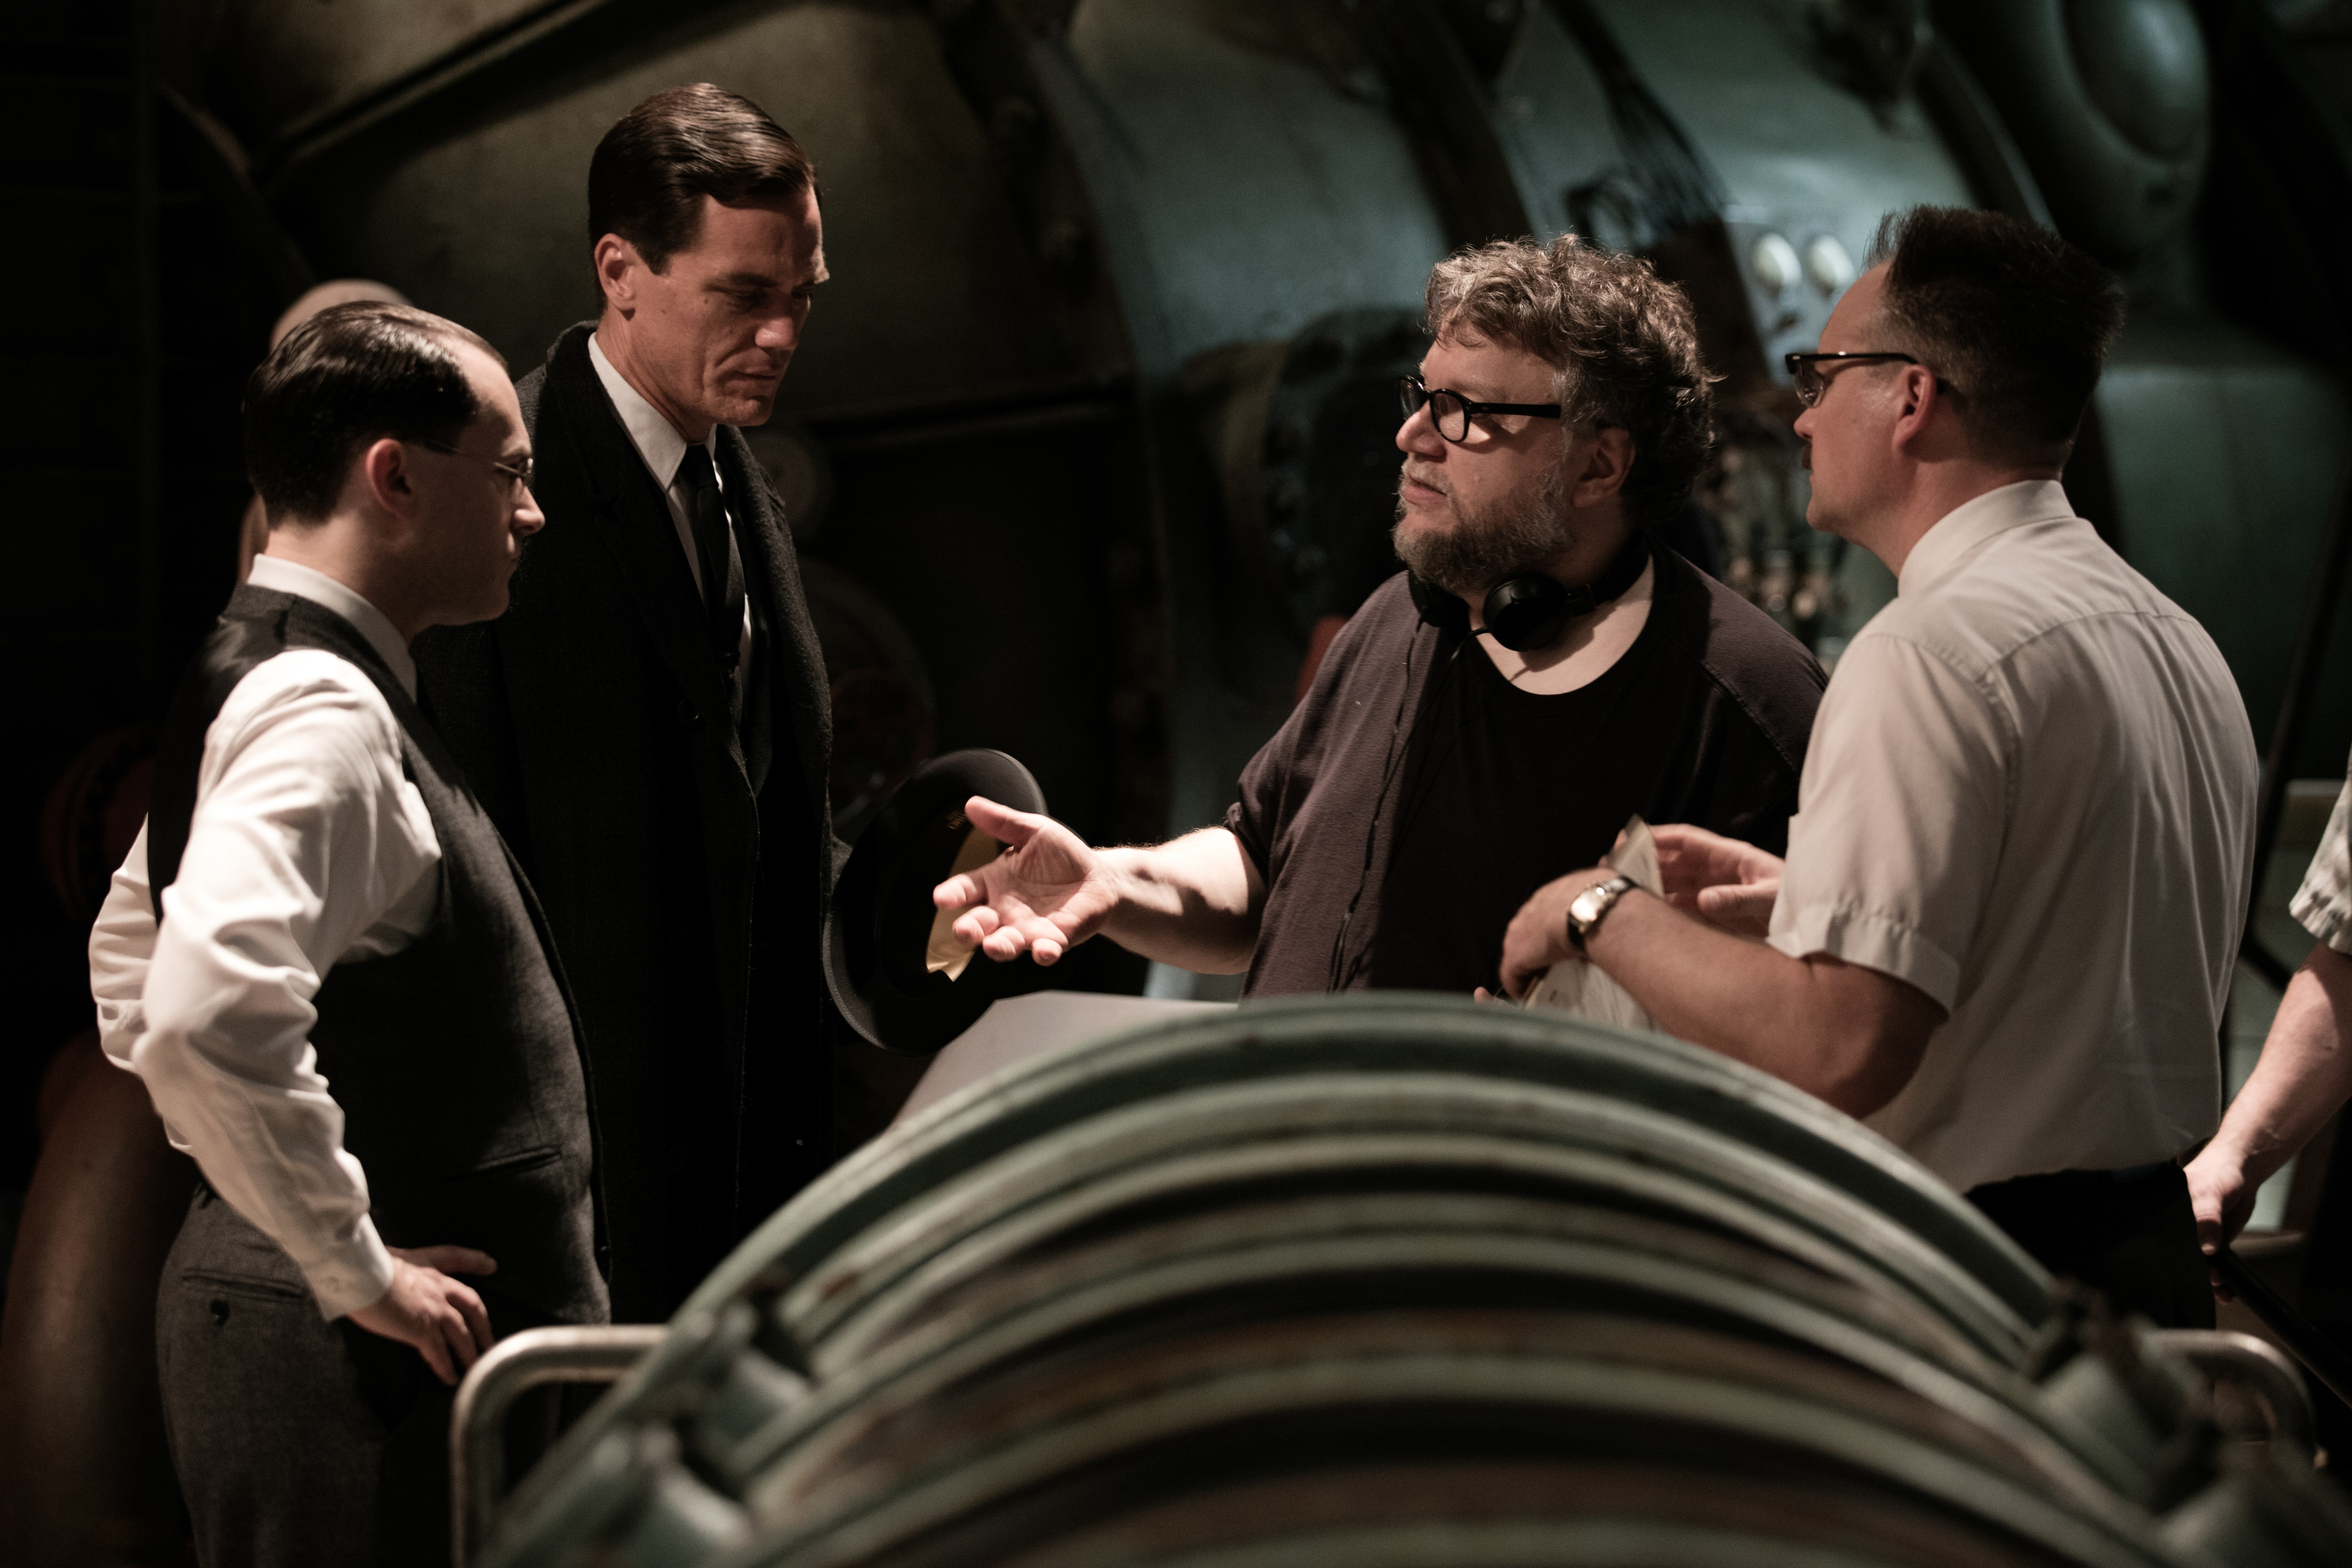 David Hewlett, Michael Shannon, Michael Stuhlbarg, and Guillermo del Toro in The Shape of Water (2017)